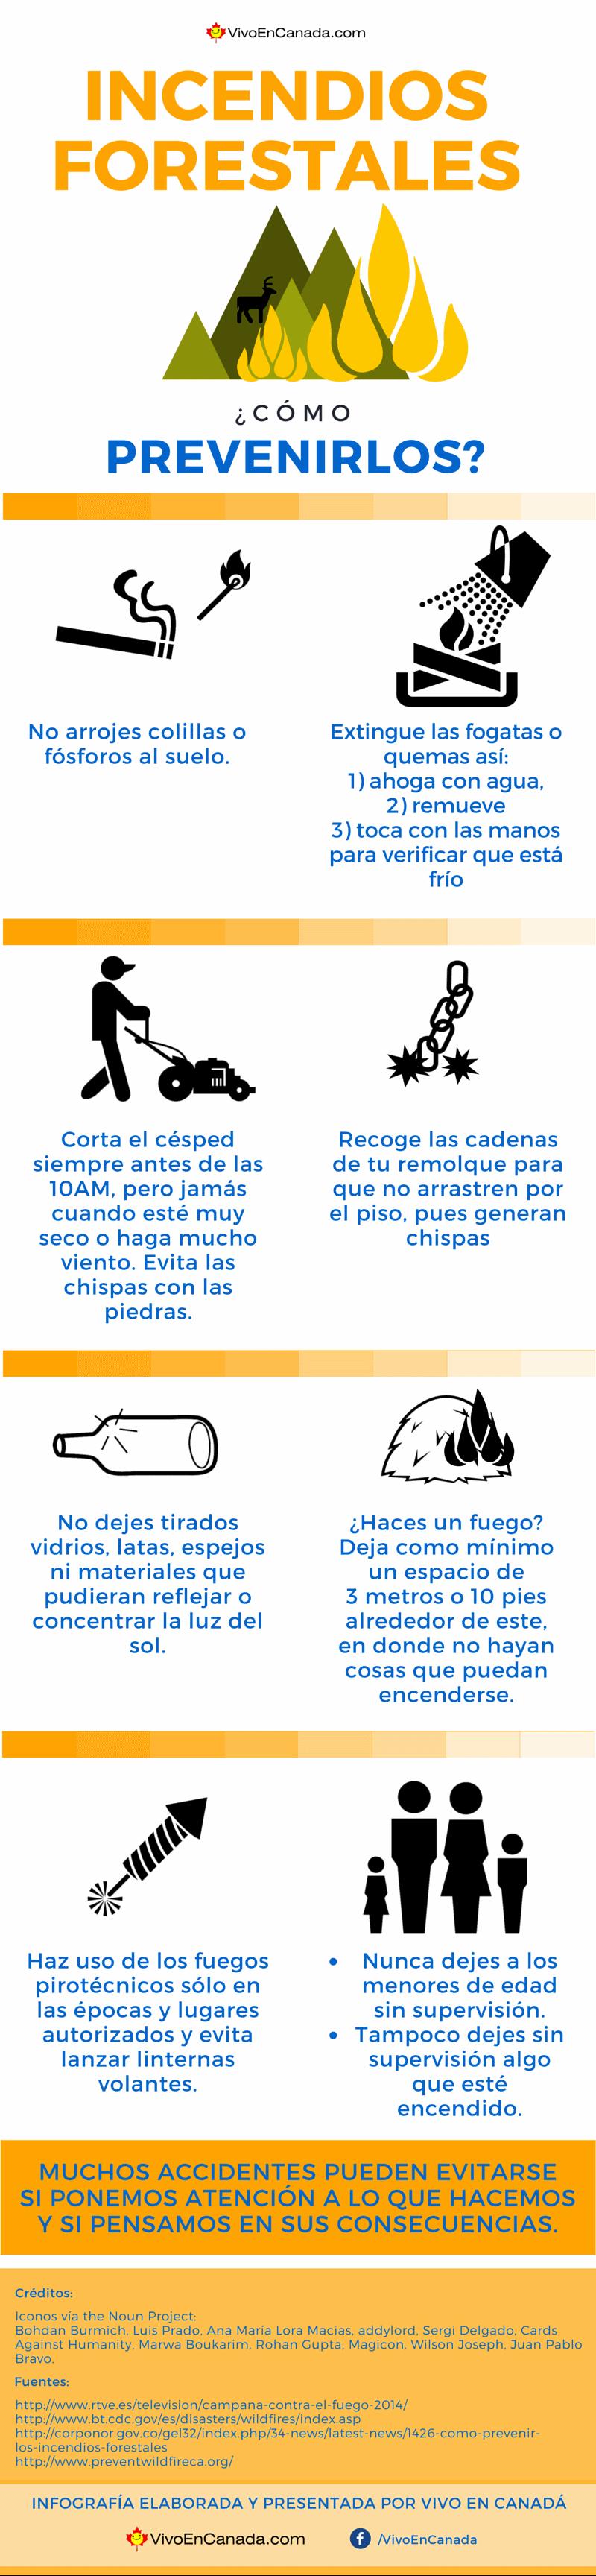 previene-Incendios-forestales-infografia